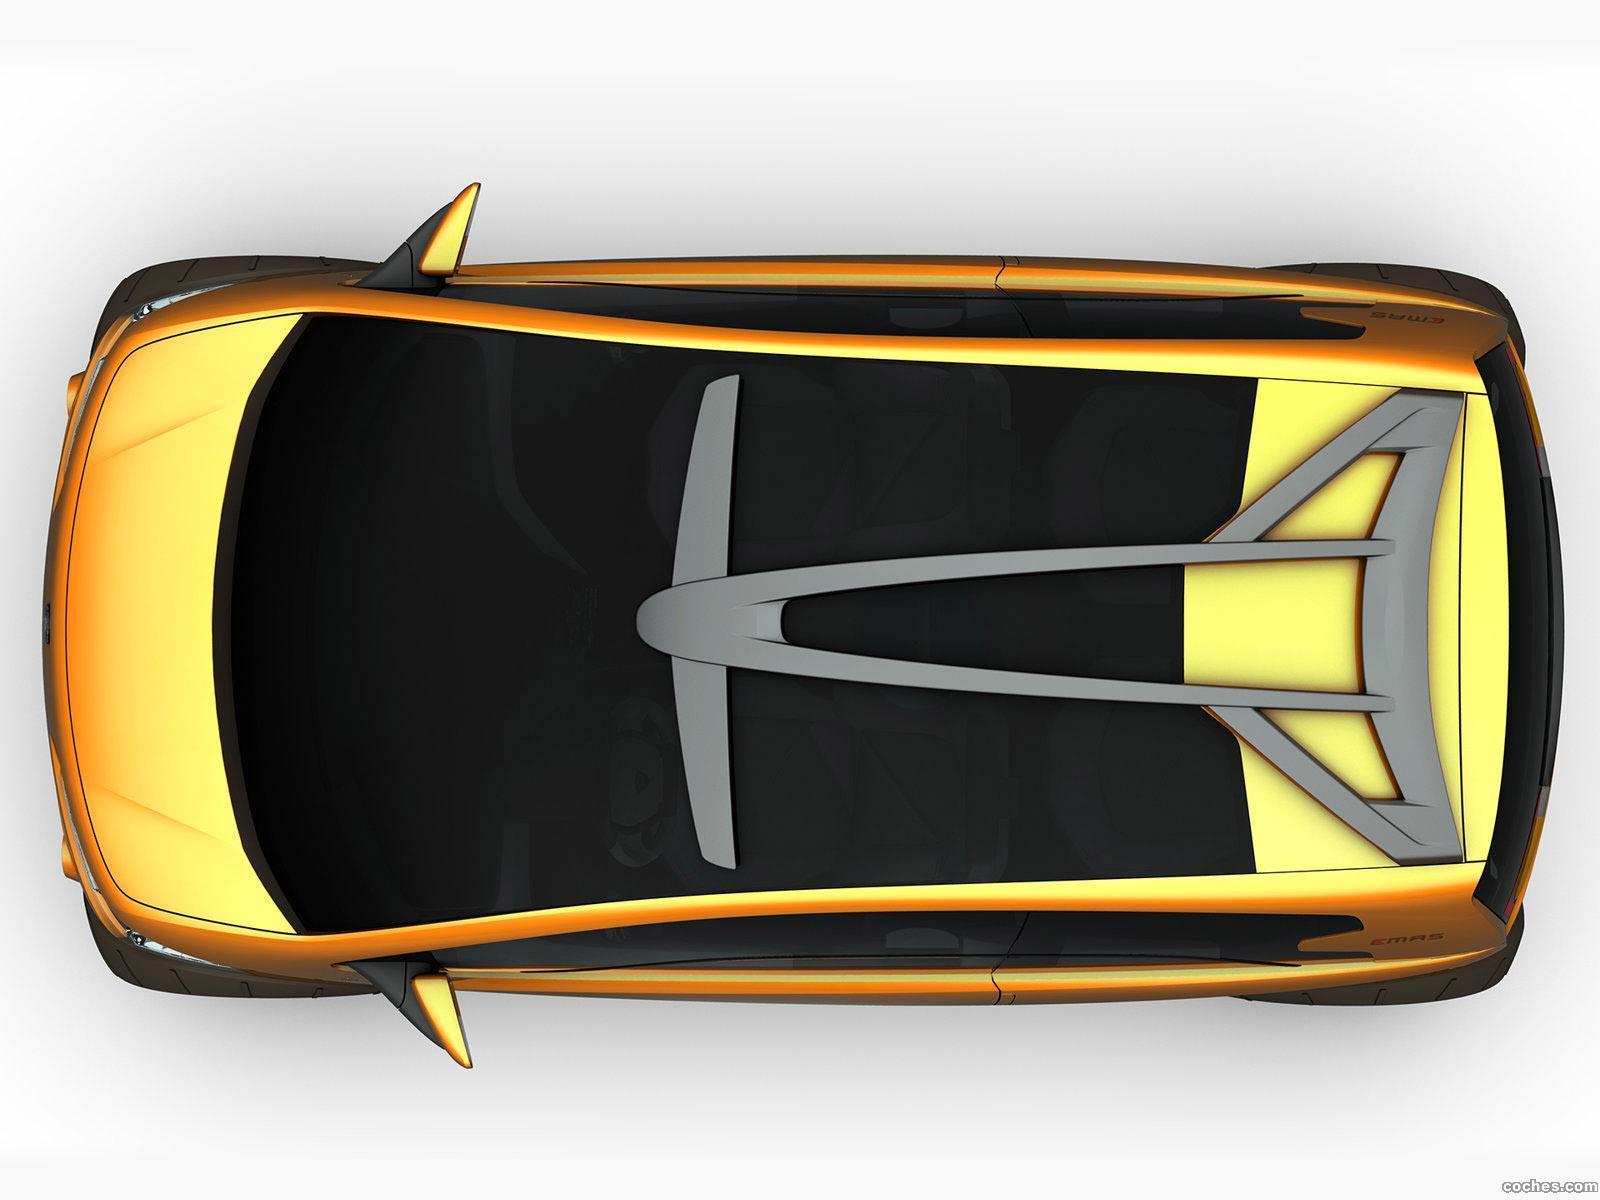 Foto 1 de Proton EMAS Country Concept by Italdesign 2010